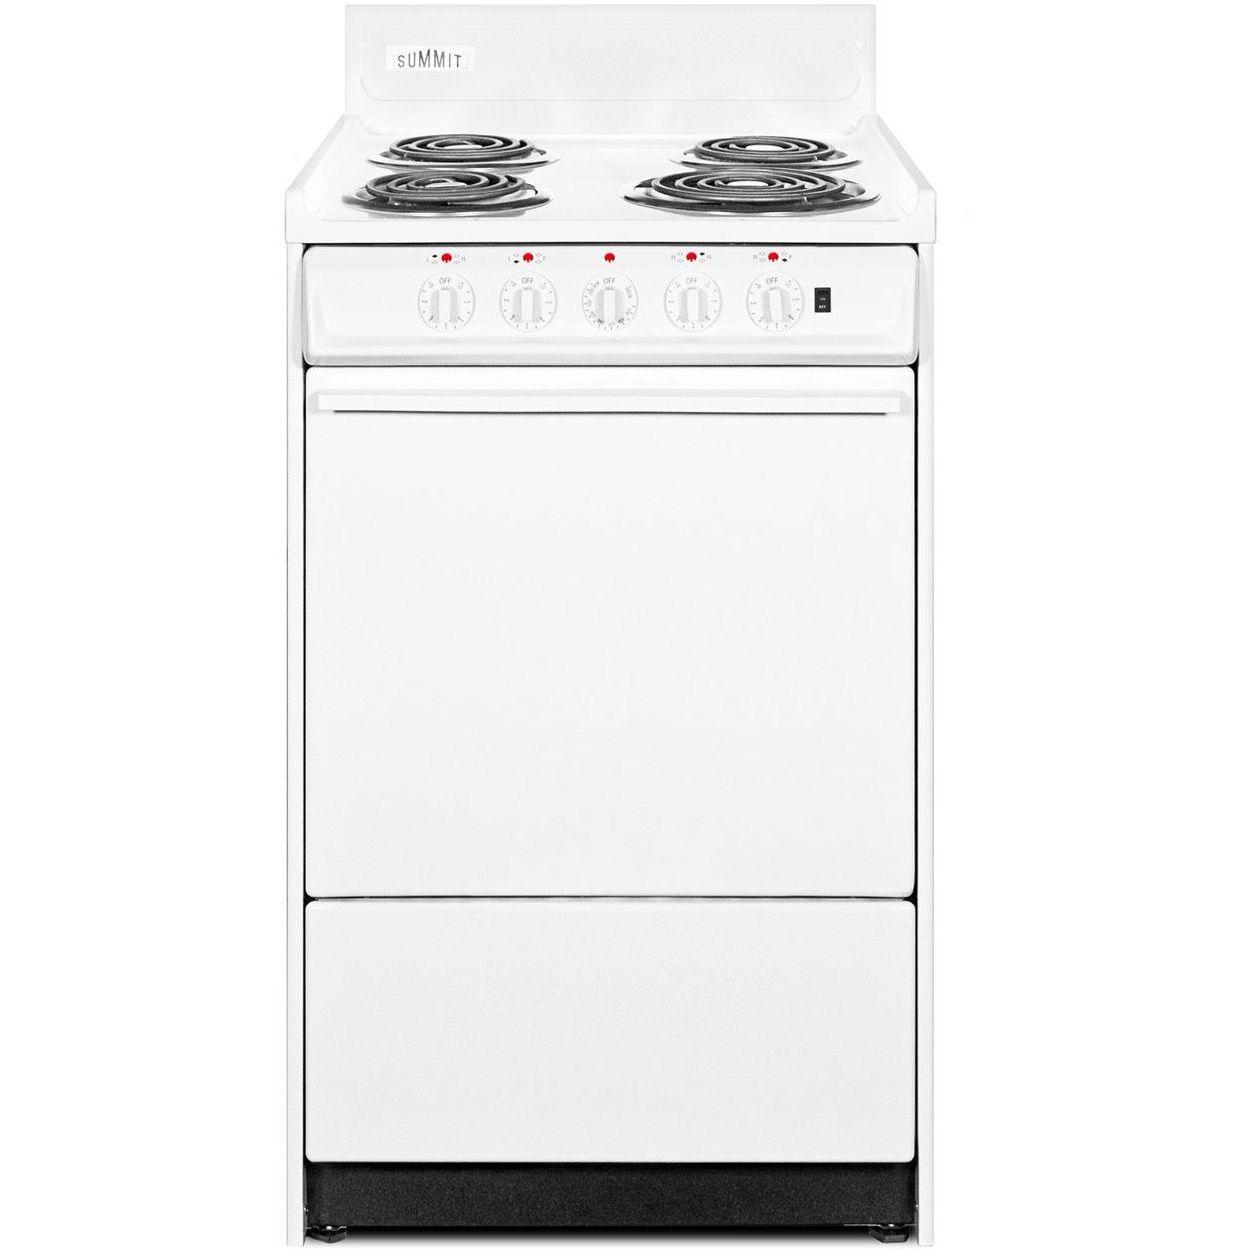 Summit WEM1171Q 20''W 4-Burner Electric Coil Top Range - White/White